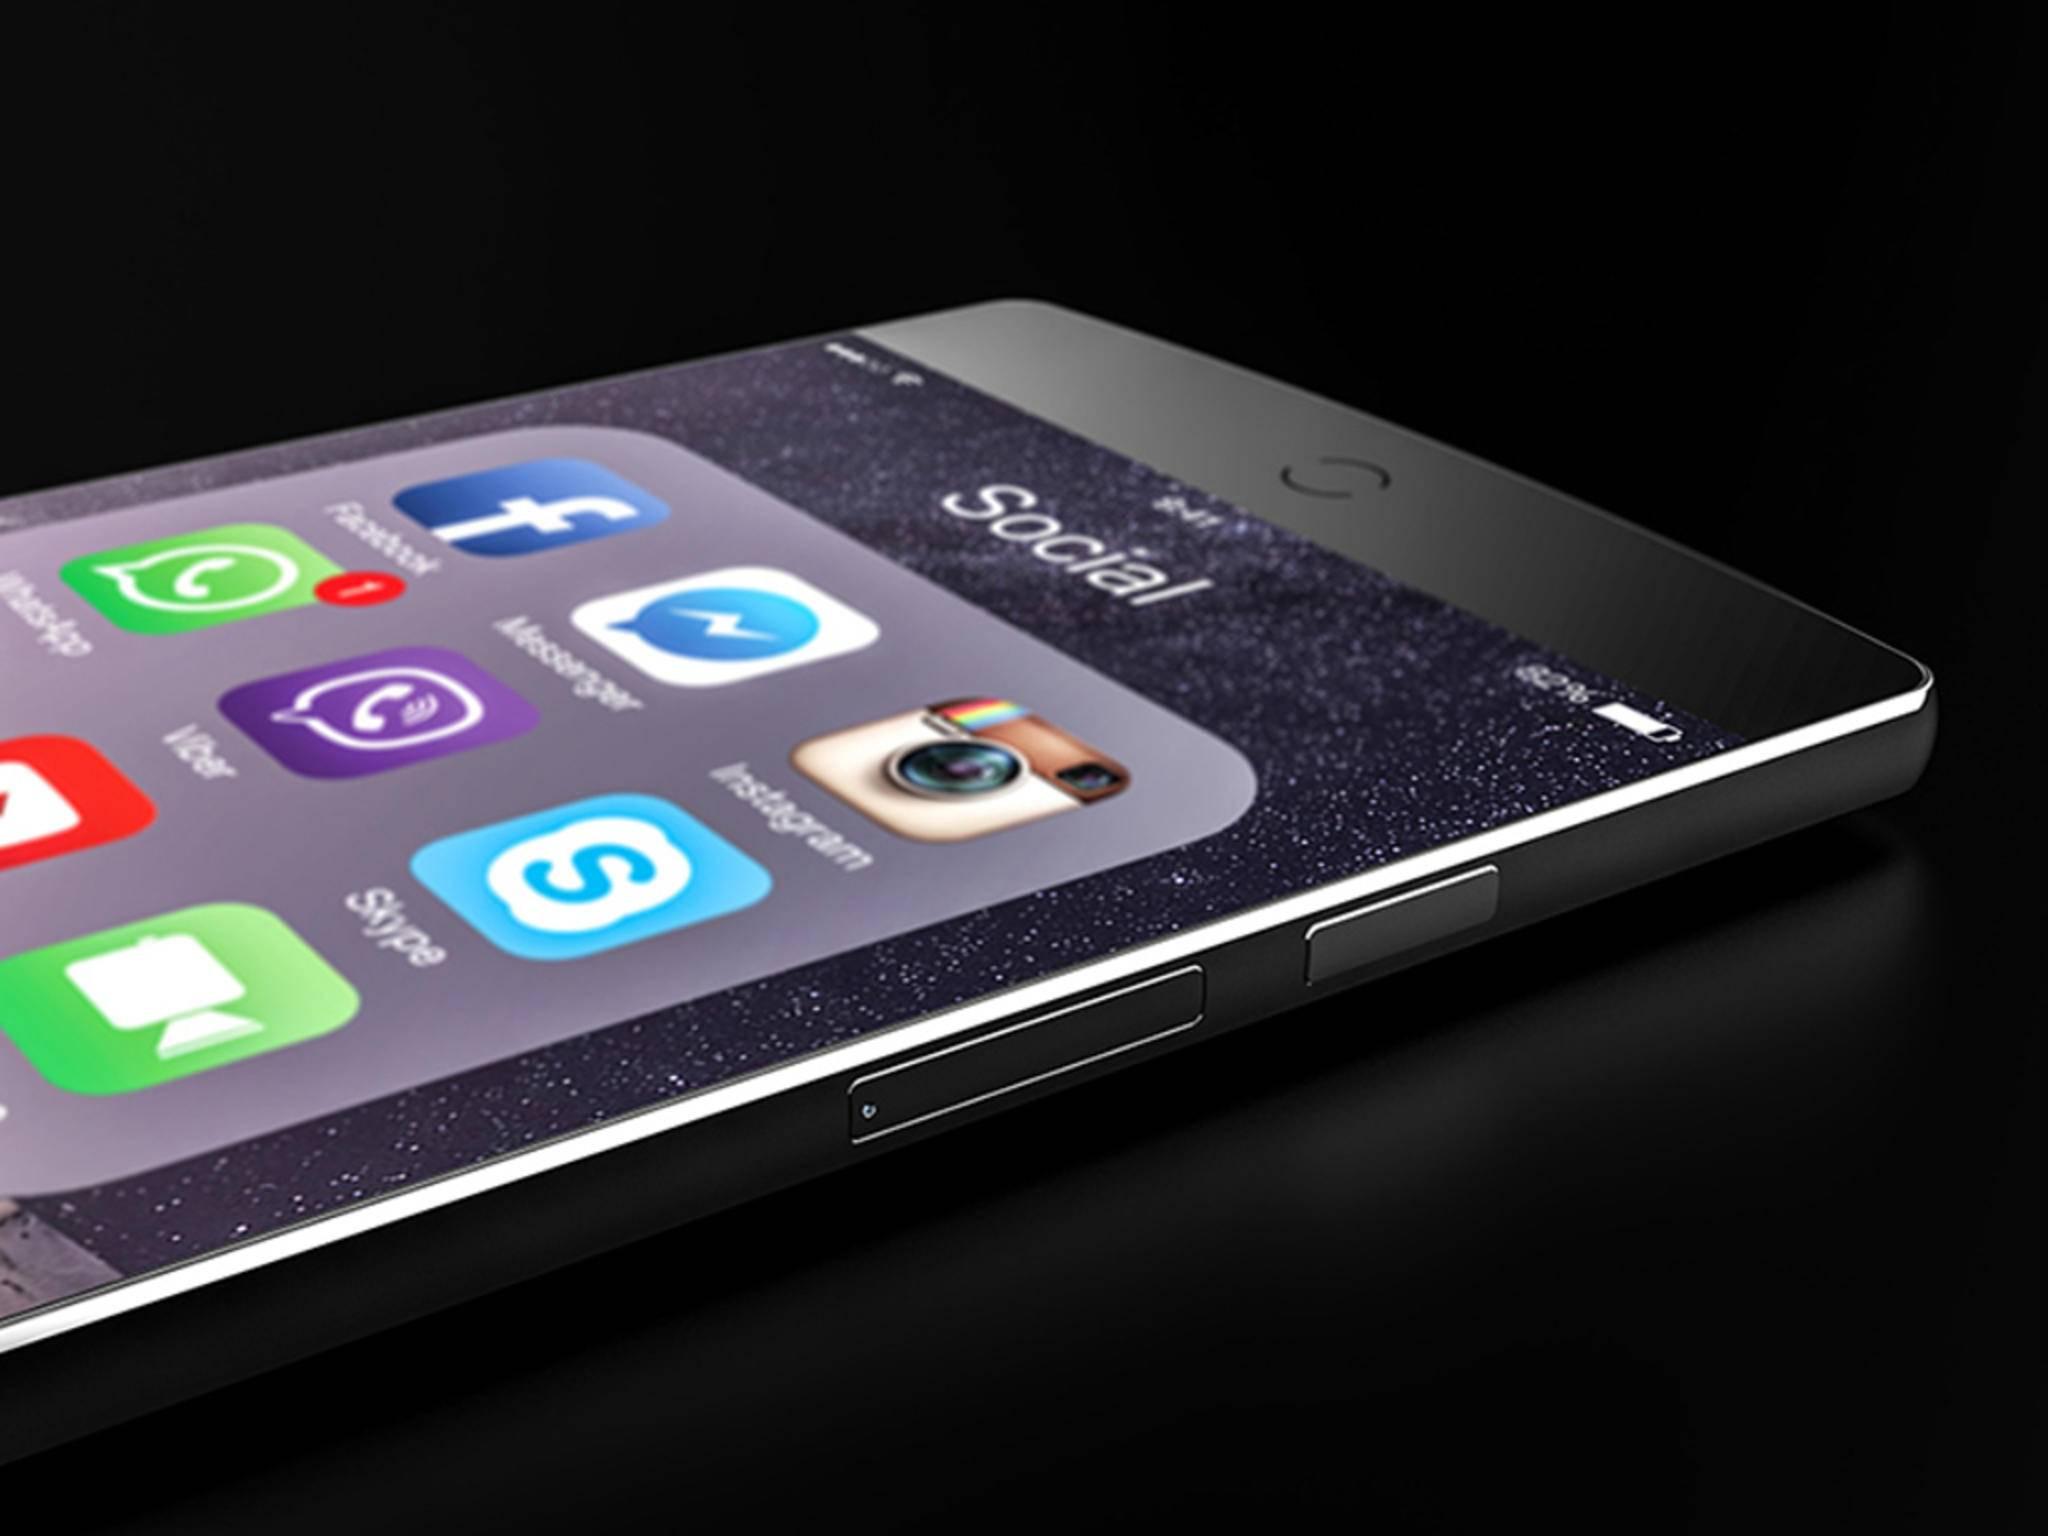 Zulieferer: iPhone 7 hat keinen 3,5-mm-Kopfhöreranschluss